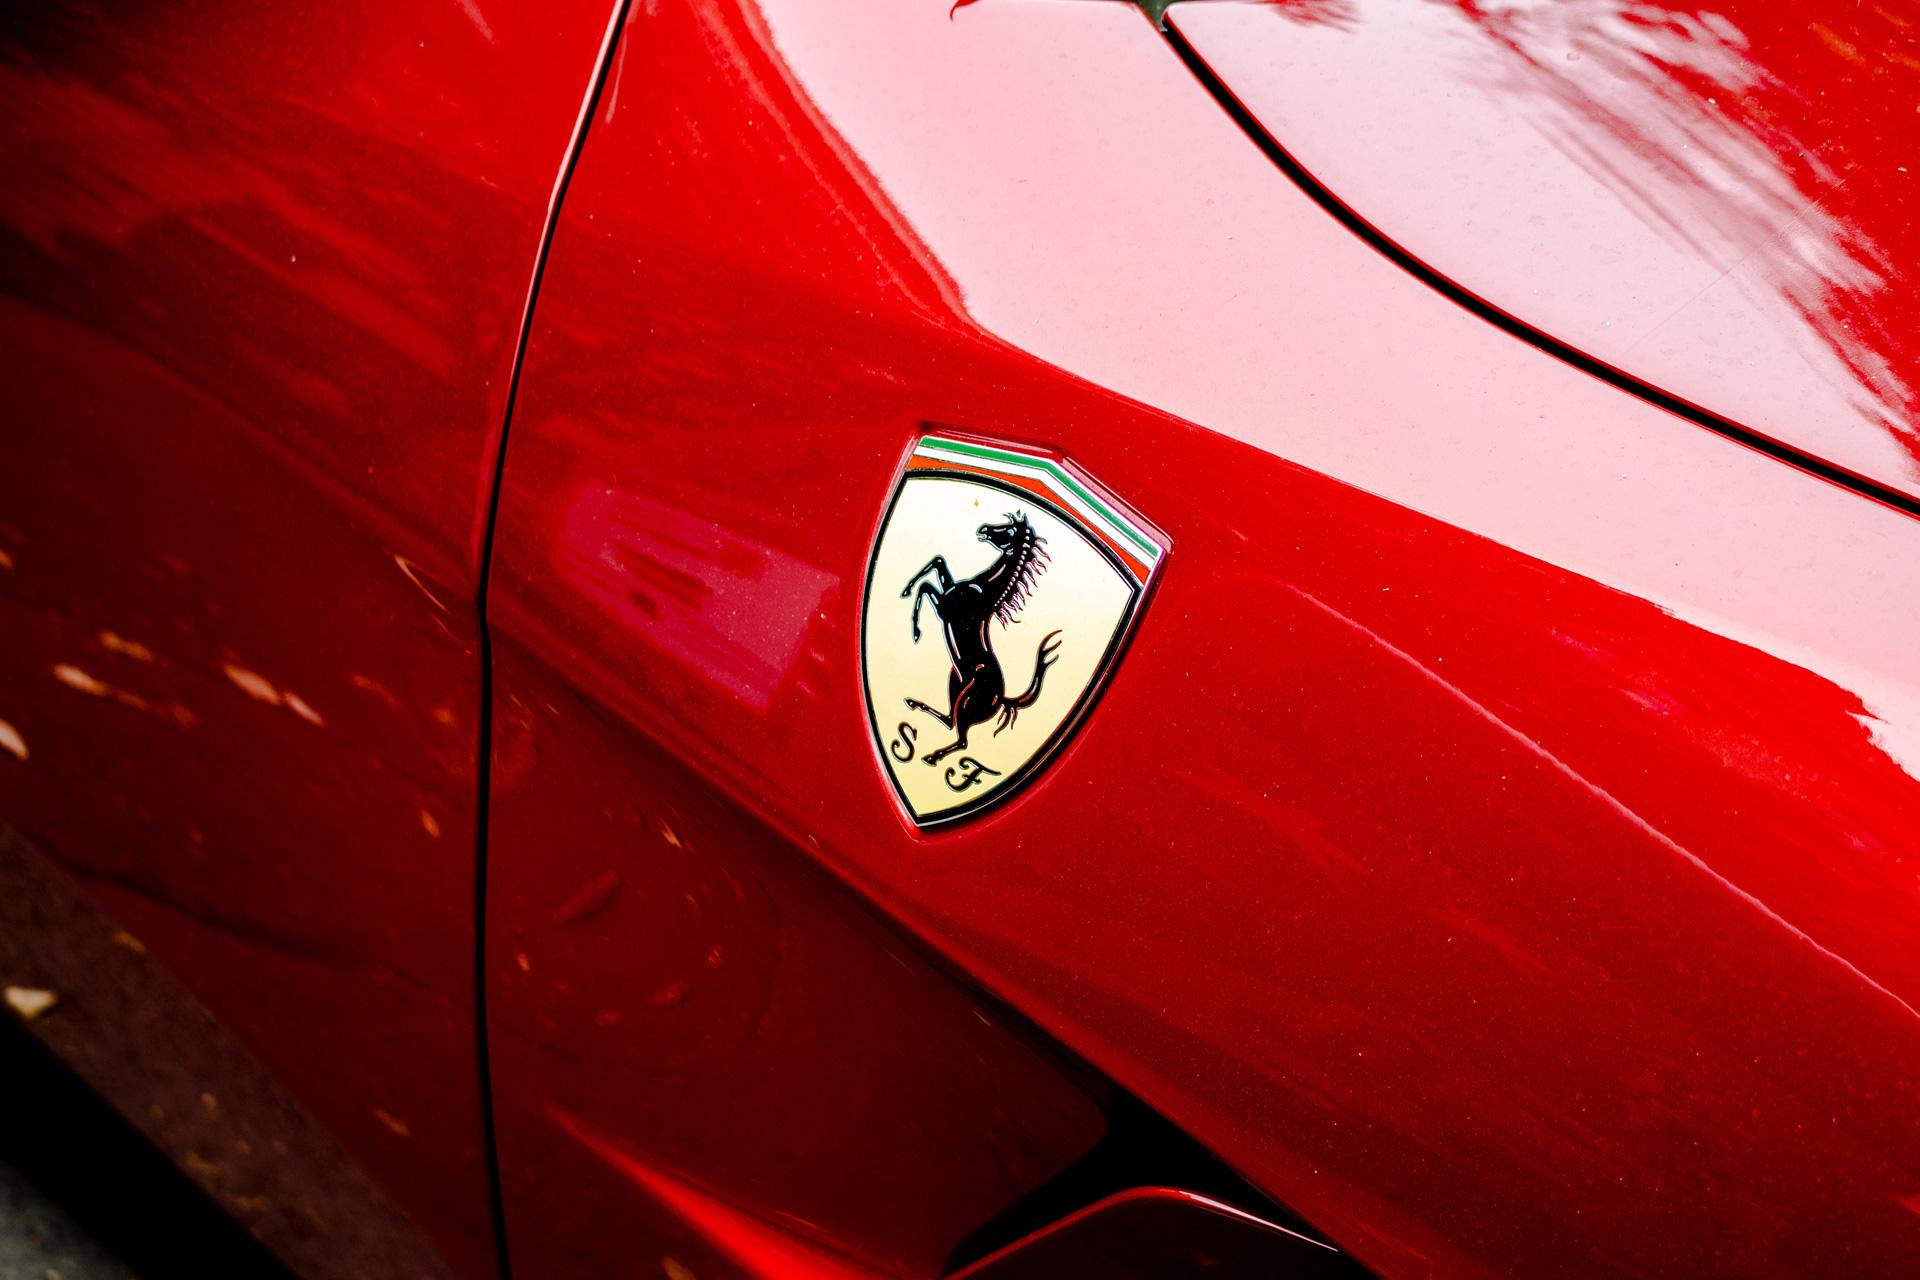 Athens STag Ferrari Driving